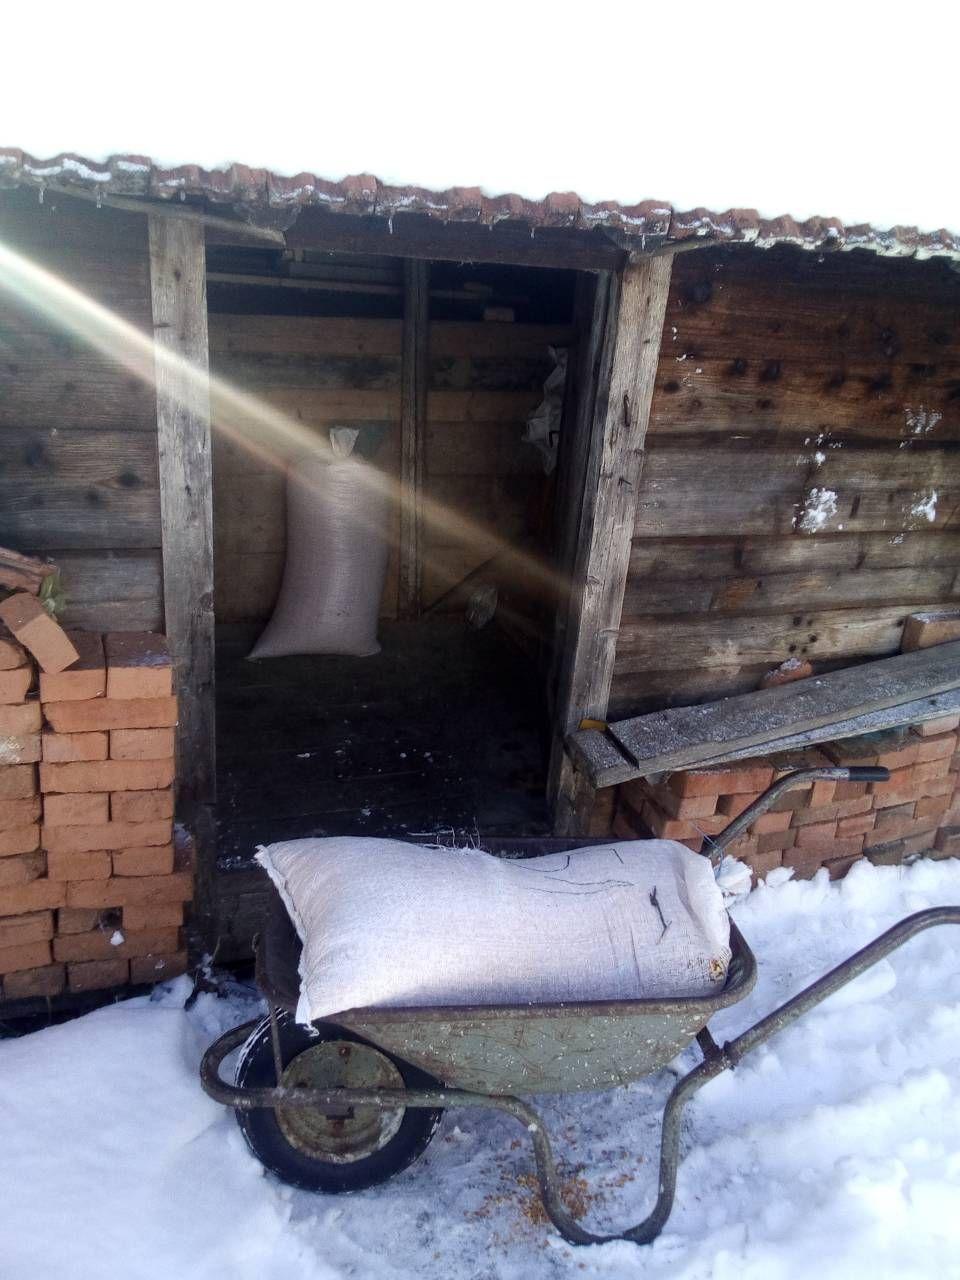 Пропала гозба – џак јутрос враћен у амбар (Снимио Миломир Пауновић)